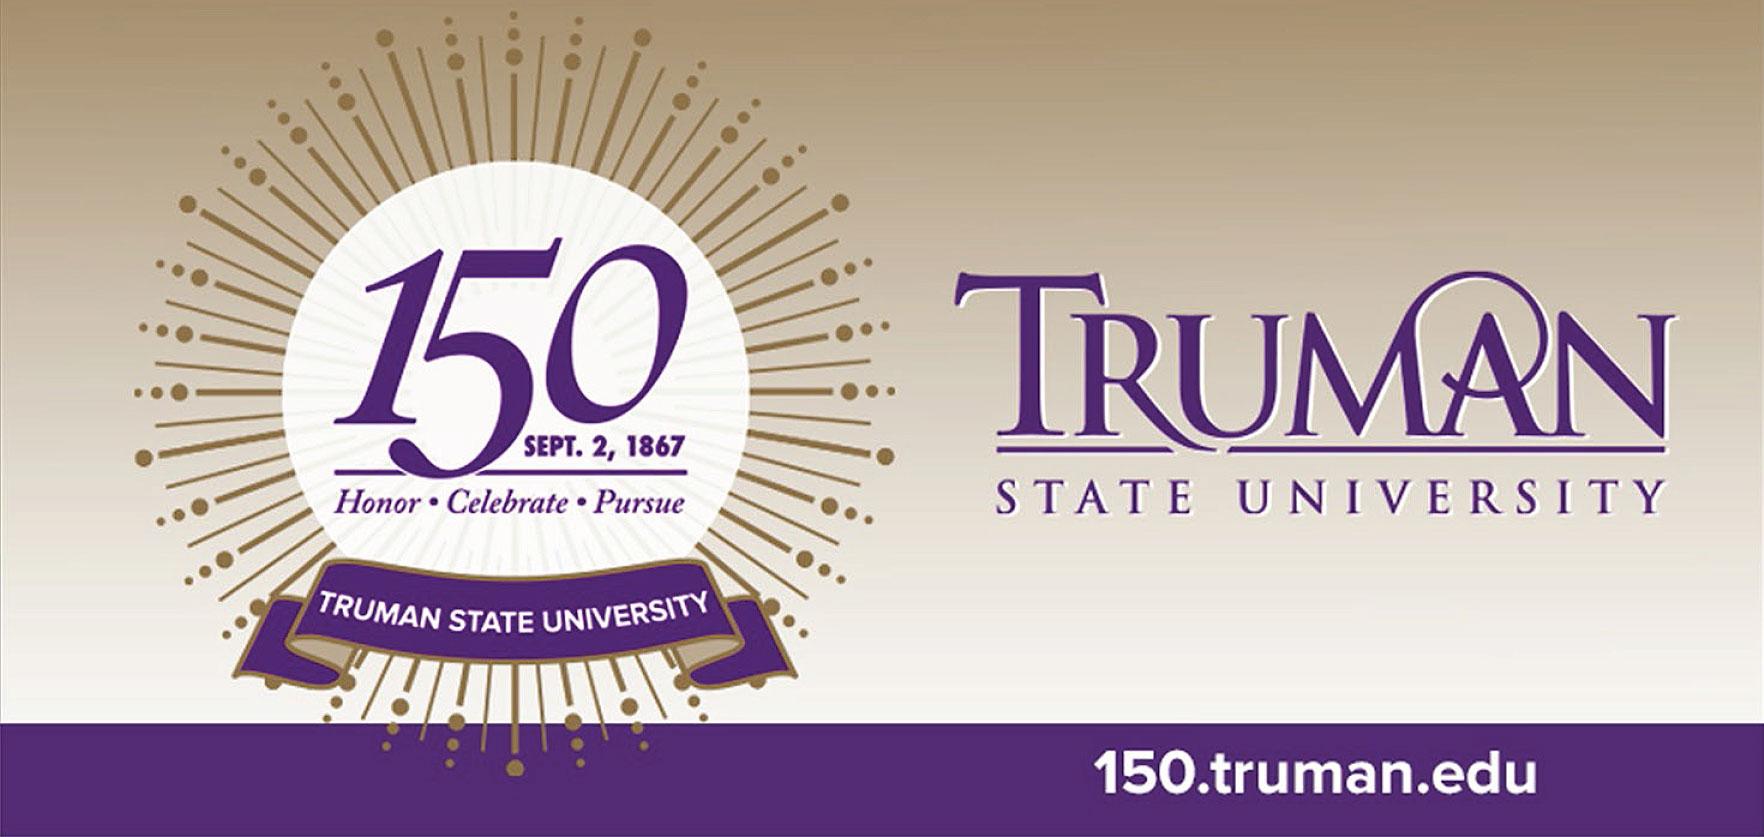 Truman State University Sesquicentennial